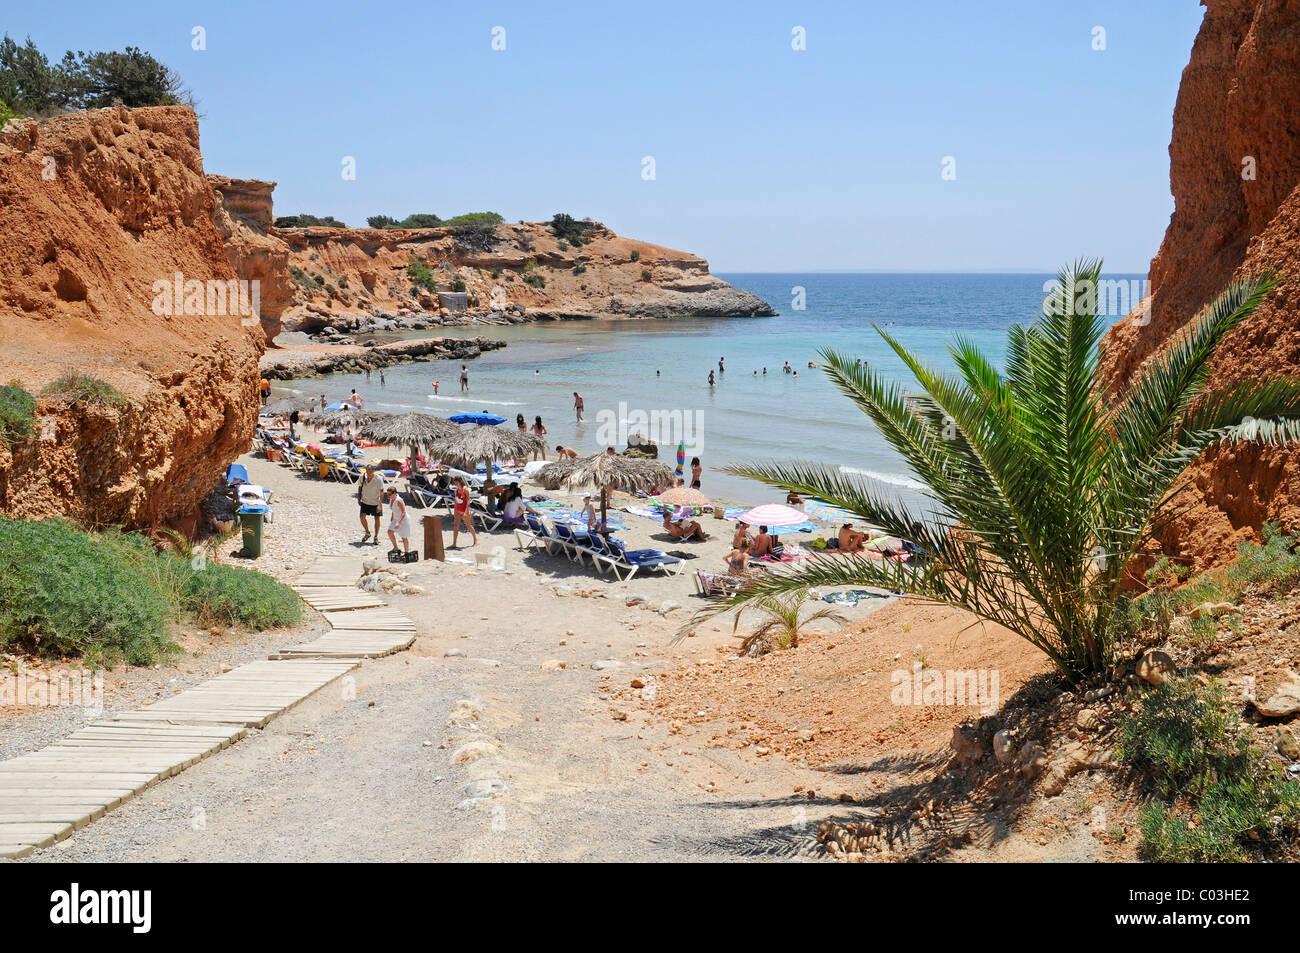 Cliffs, palm trees and bay, Sa Caleta, beach, Ibiza, Pityuses, Balearic Islands, Spain, Europe - Stock Image